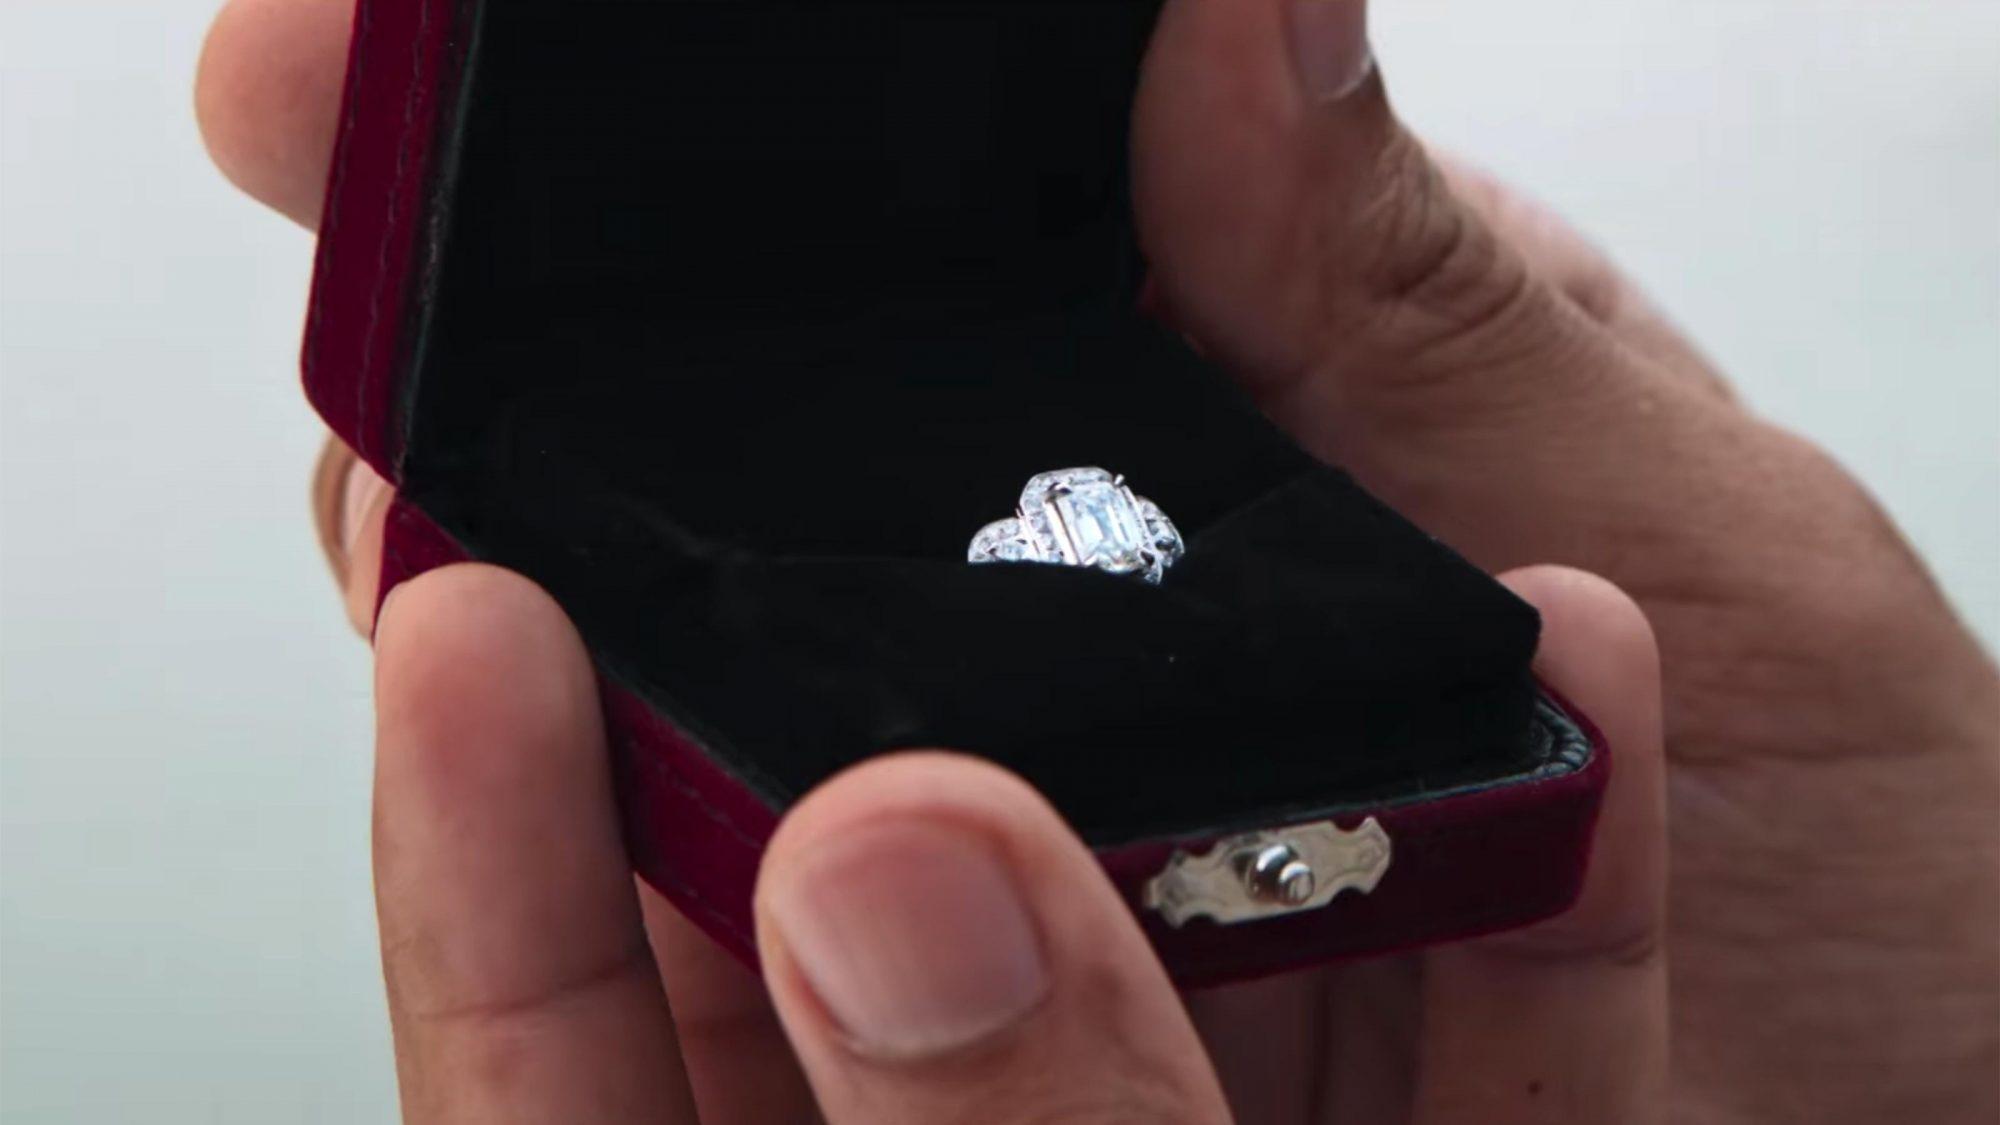 Rachel's engagement ring: $7,100